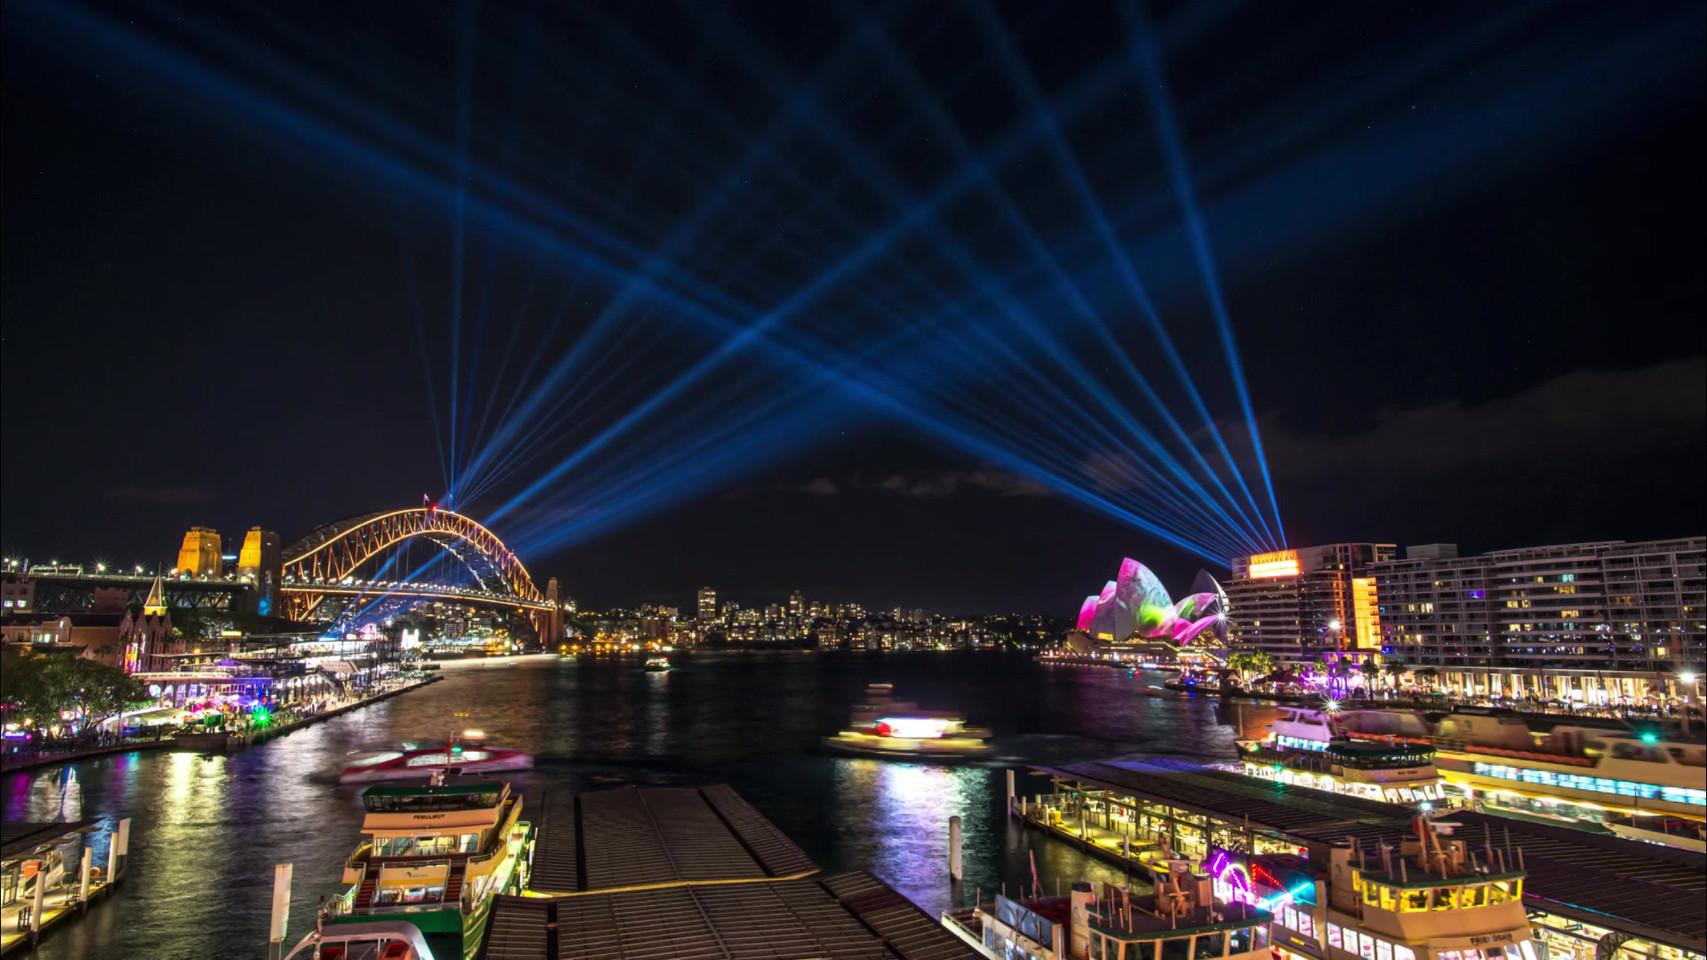 Vivid Sydney 2018 - The Final Countdown